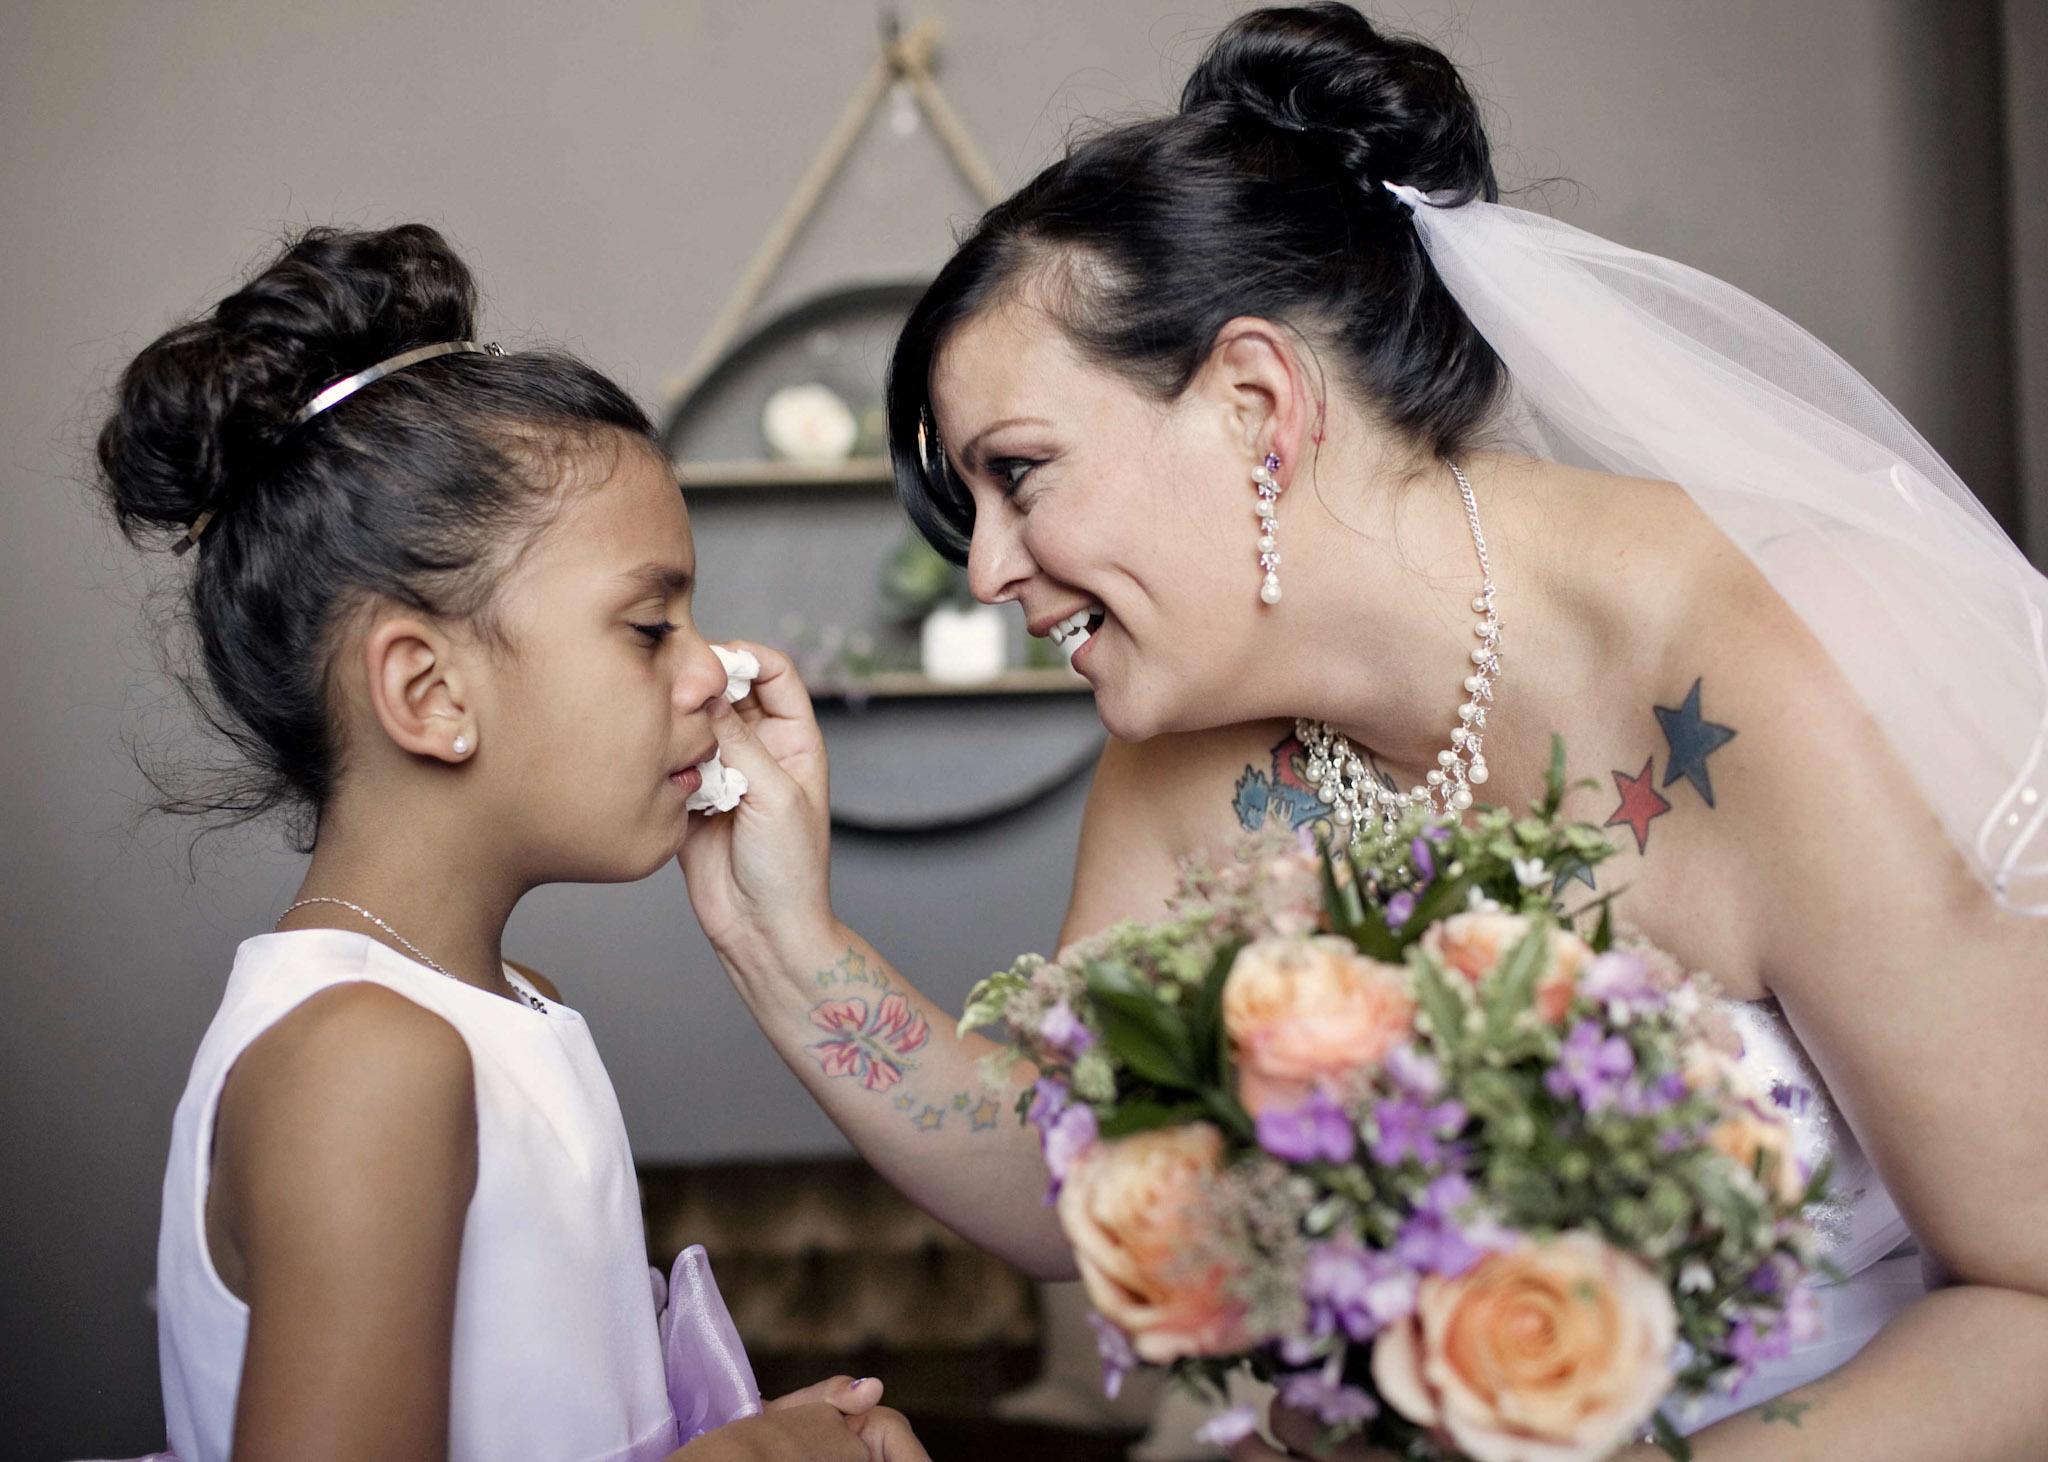 Kansas_City_Small_Wedding_Venue_Elope_Intimate_Ceremony_Budget_Affordable_340M&T.jpg